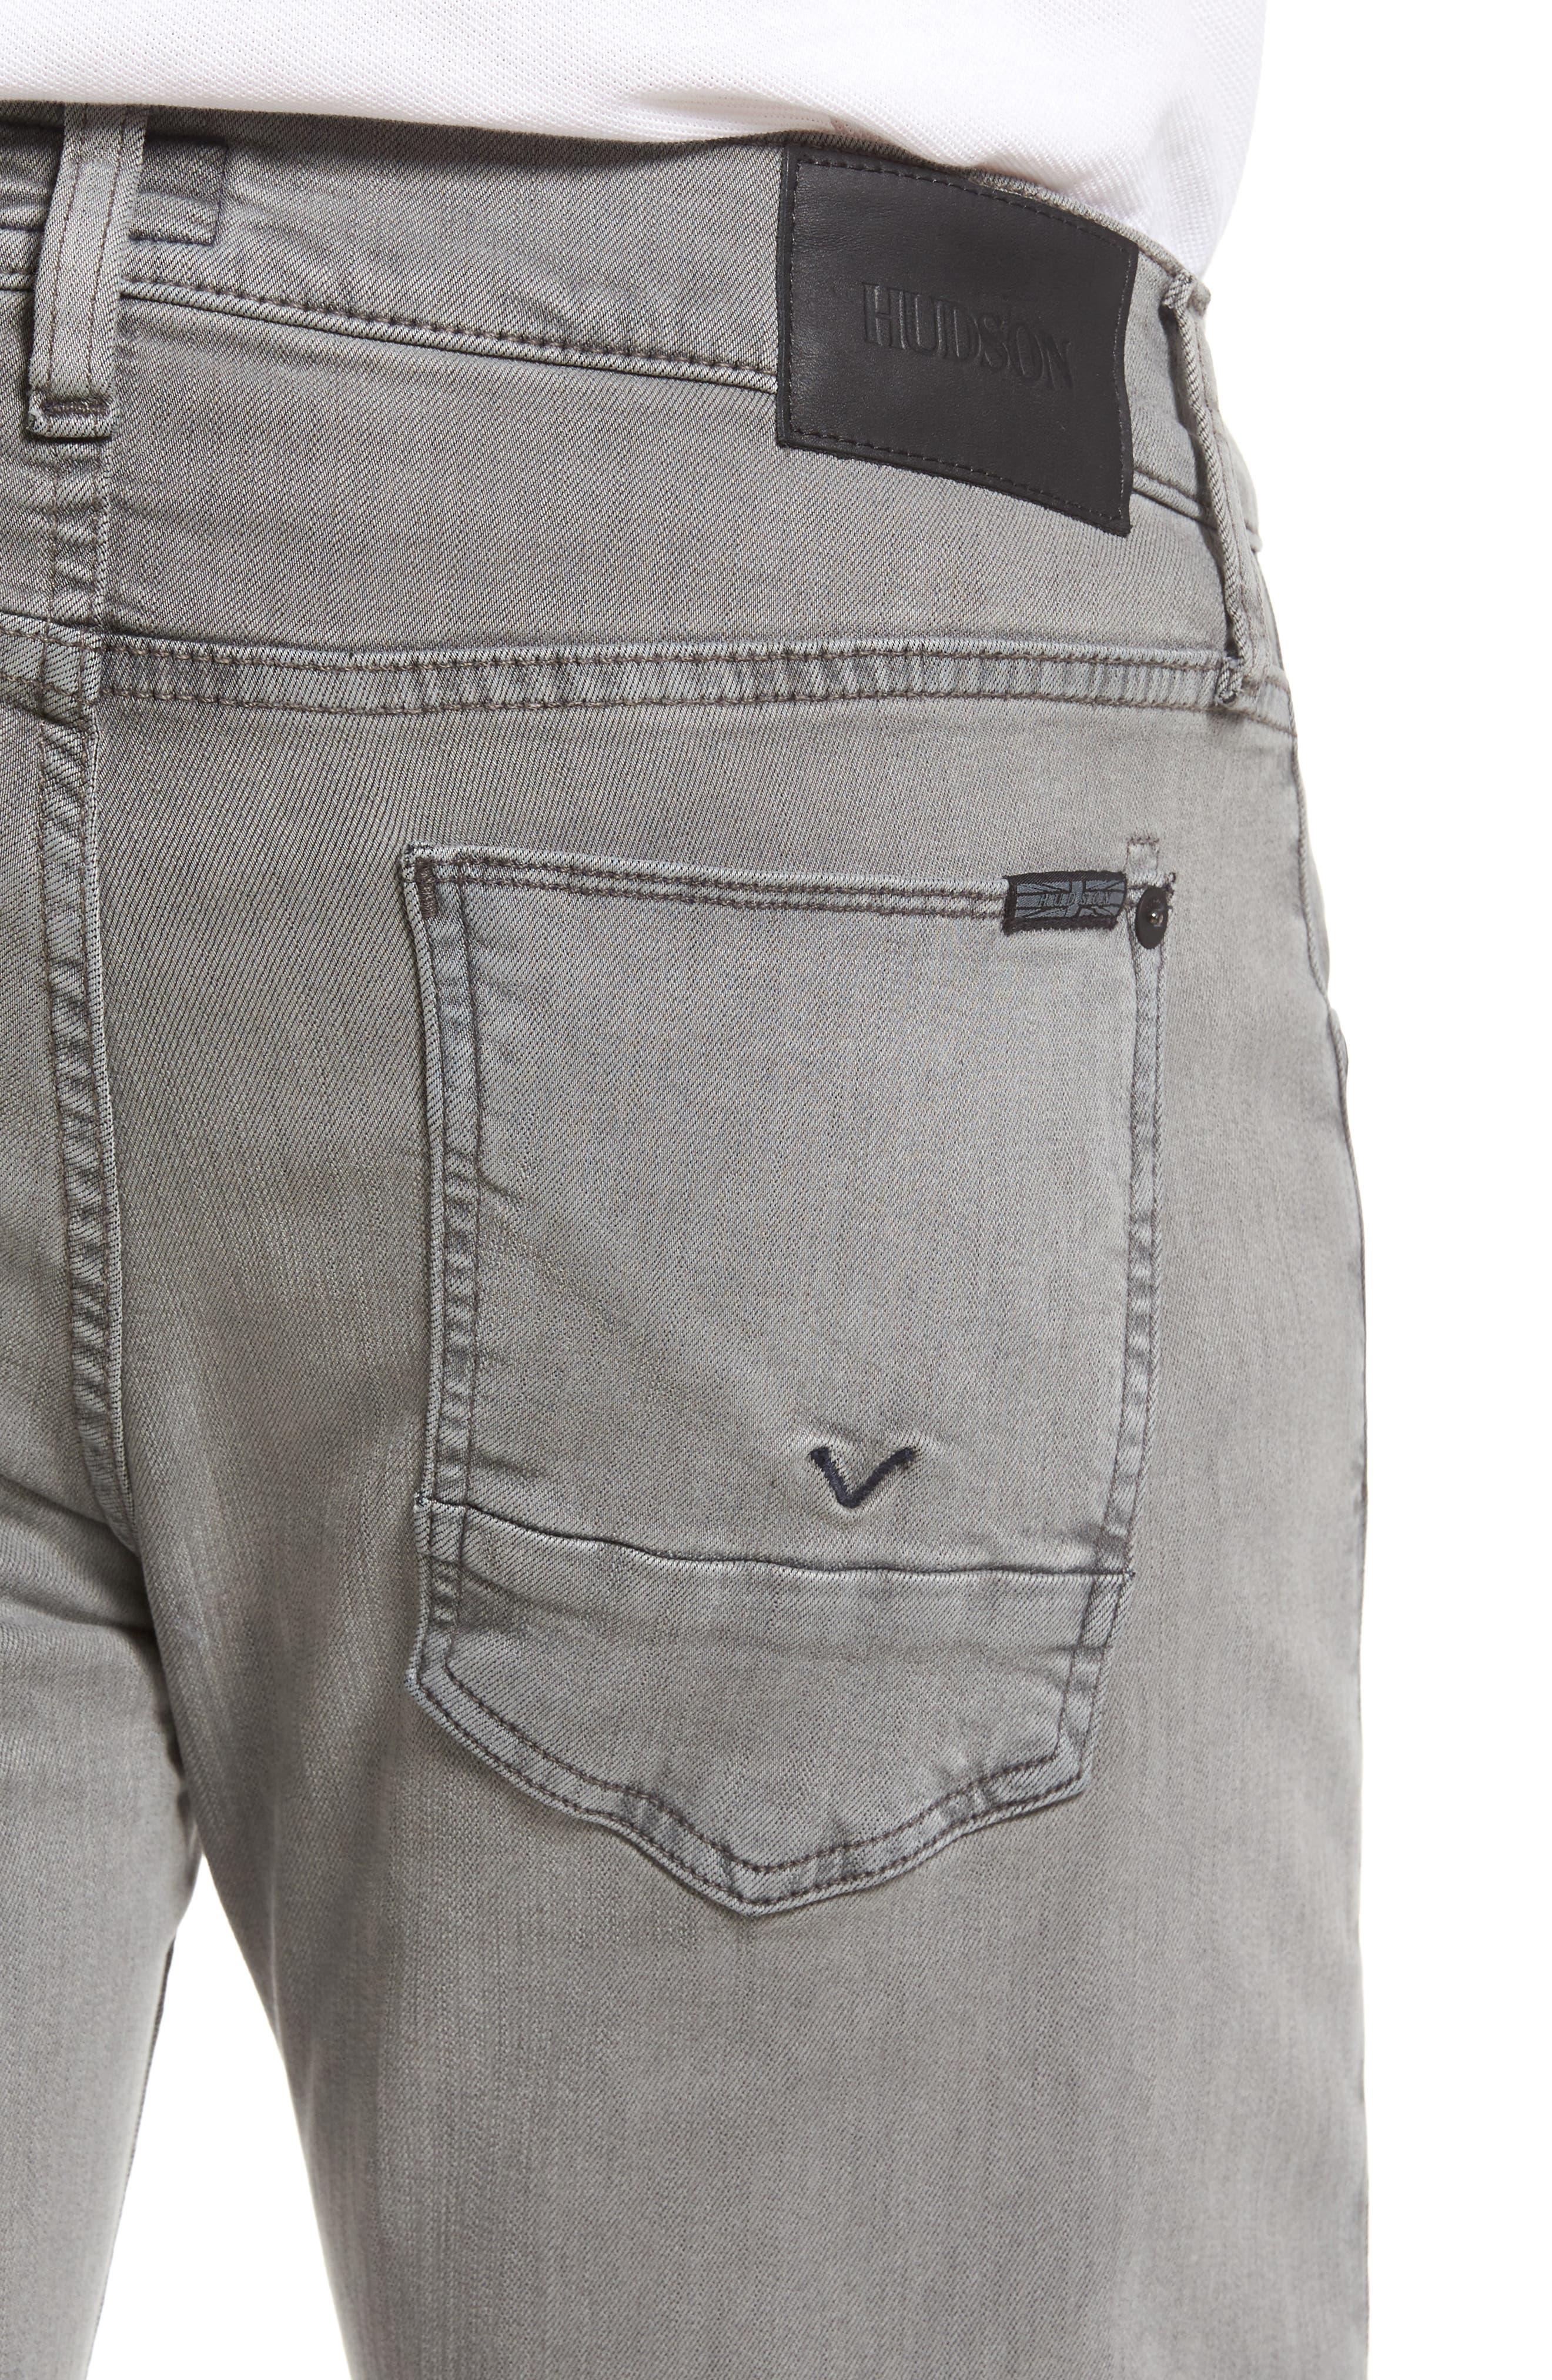 Blake Slim Fit Jeans,                             Alternate thumbnail 4, color,                             023